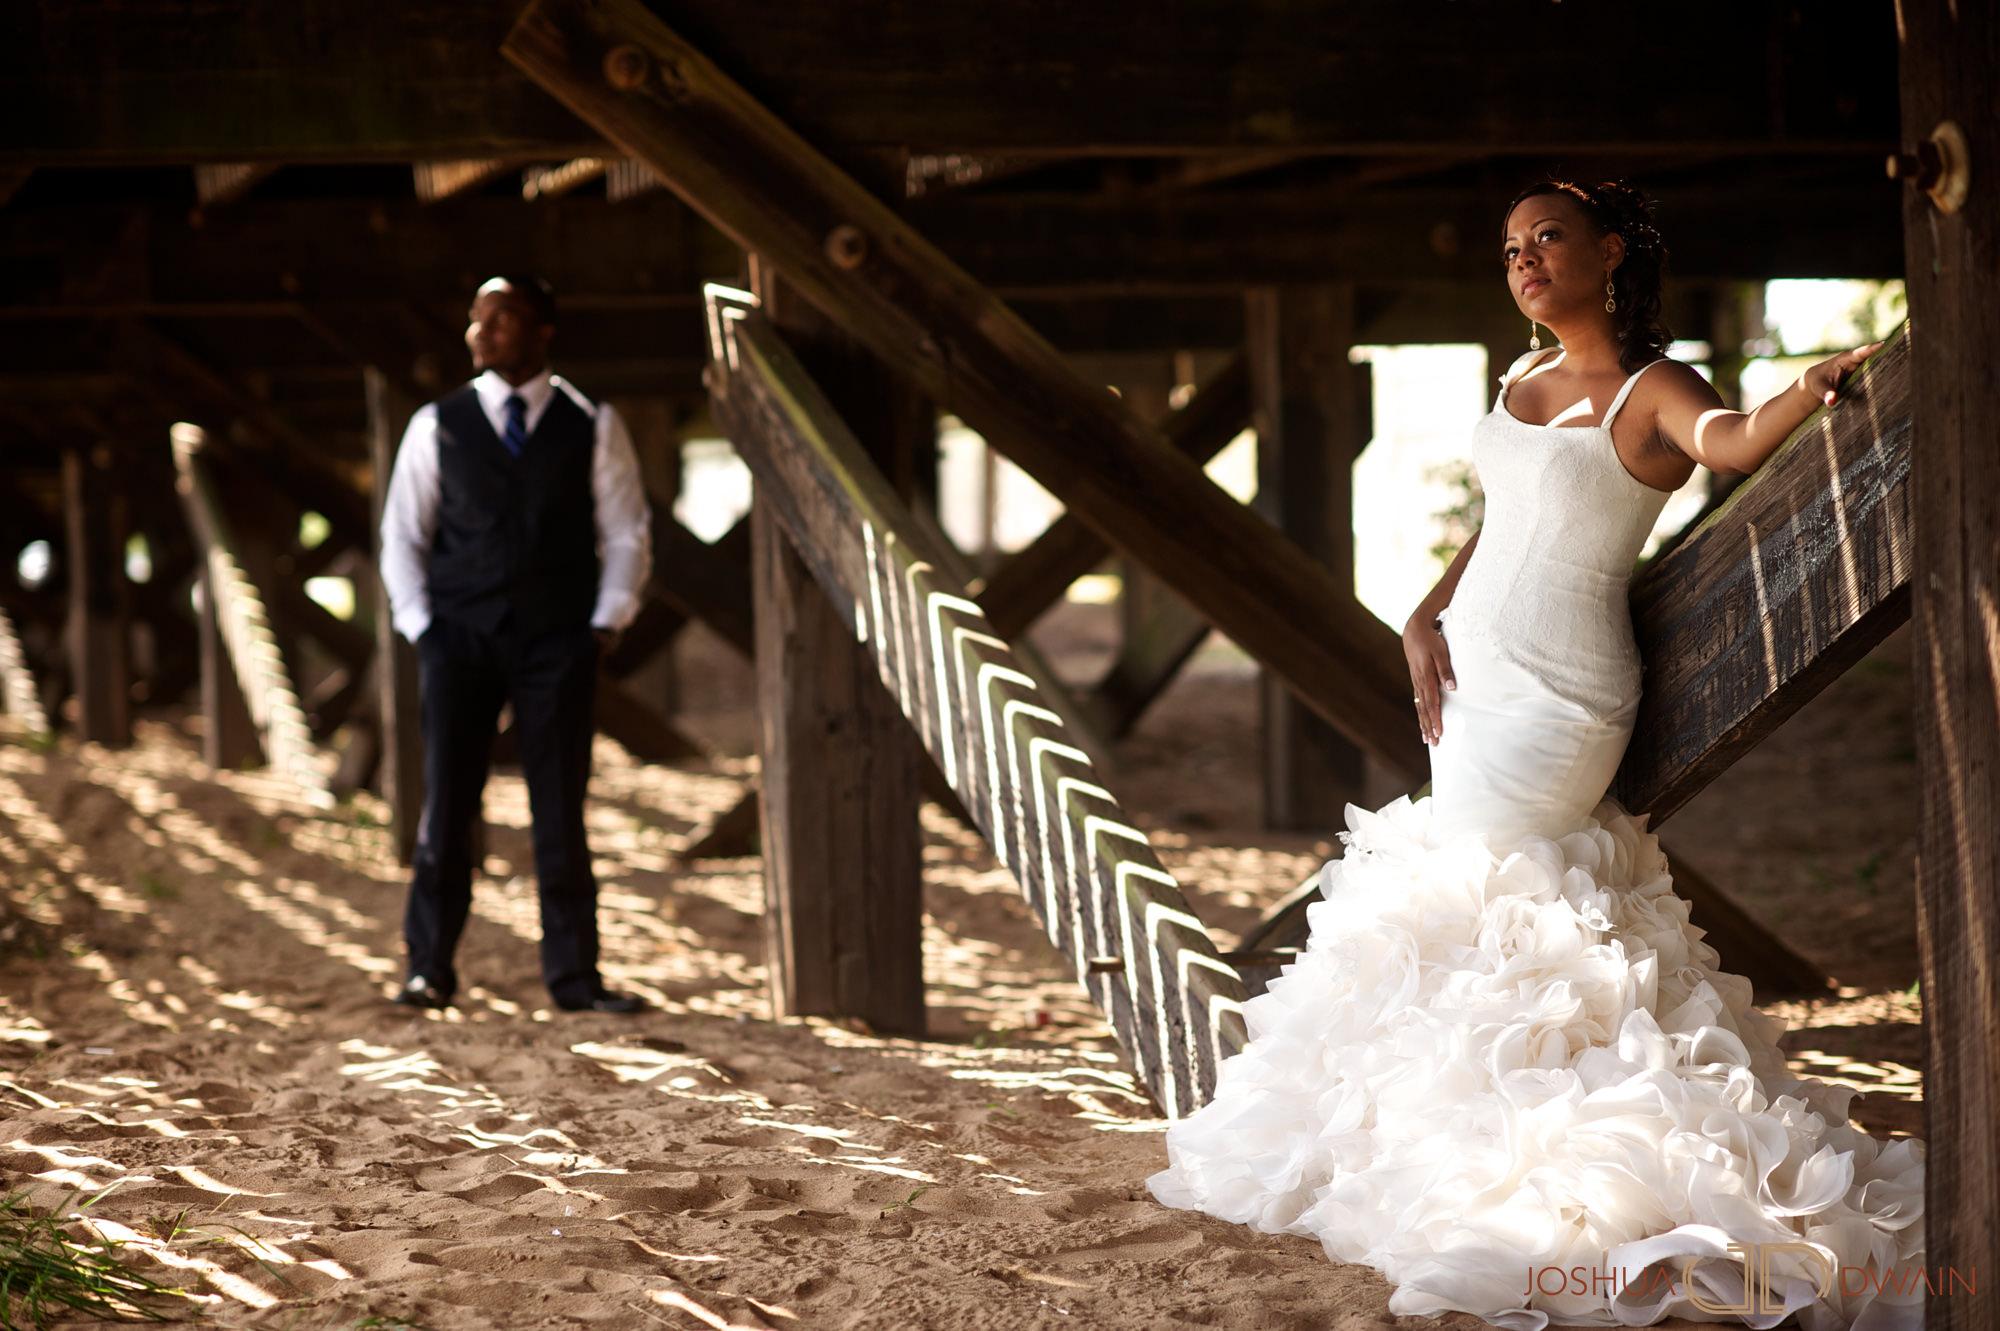 charisse-haynes-006-Vanderbilt-at-South-Beach-Wedding-state-island-new-york-wedding-photographer-joshua-dwain-2012-09-16_ch_198